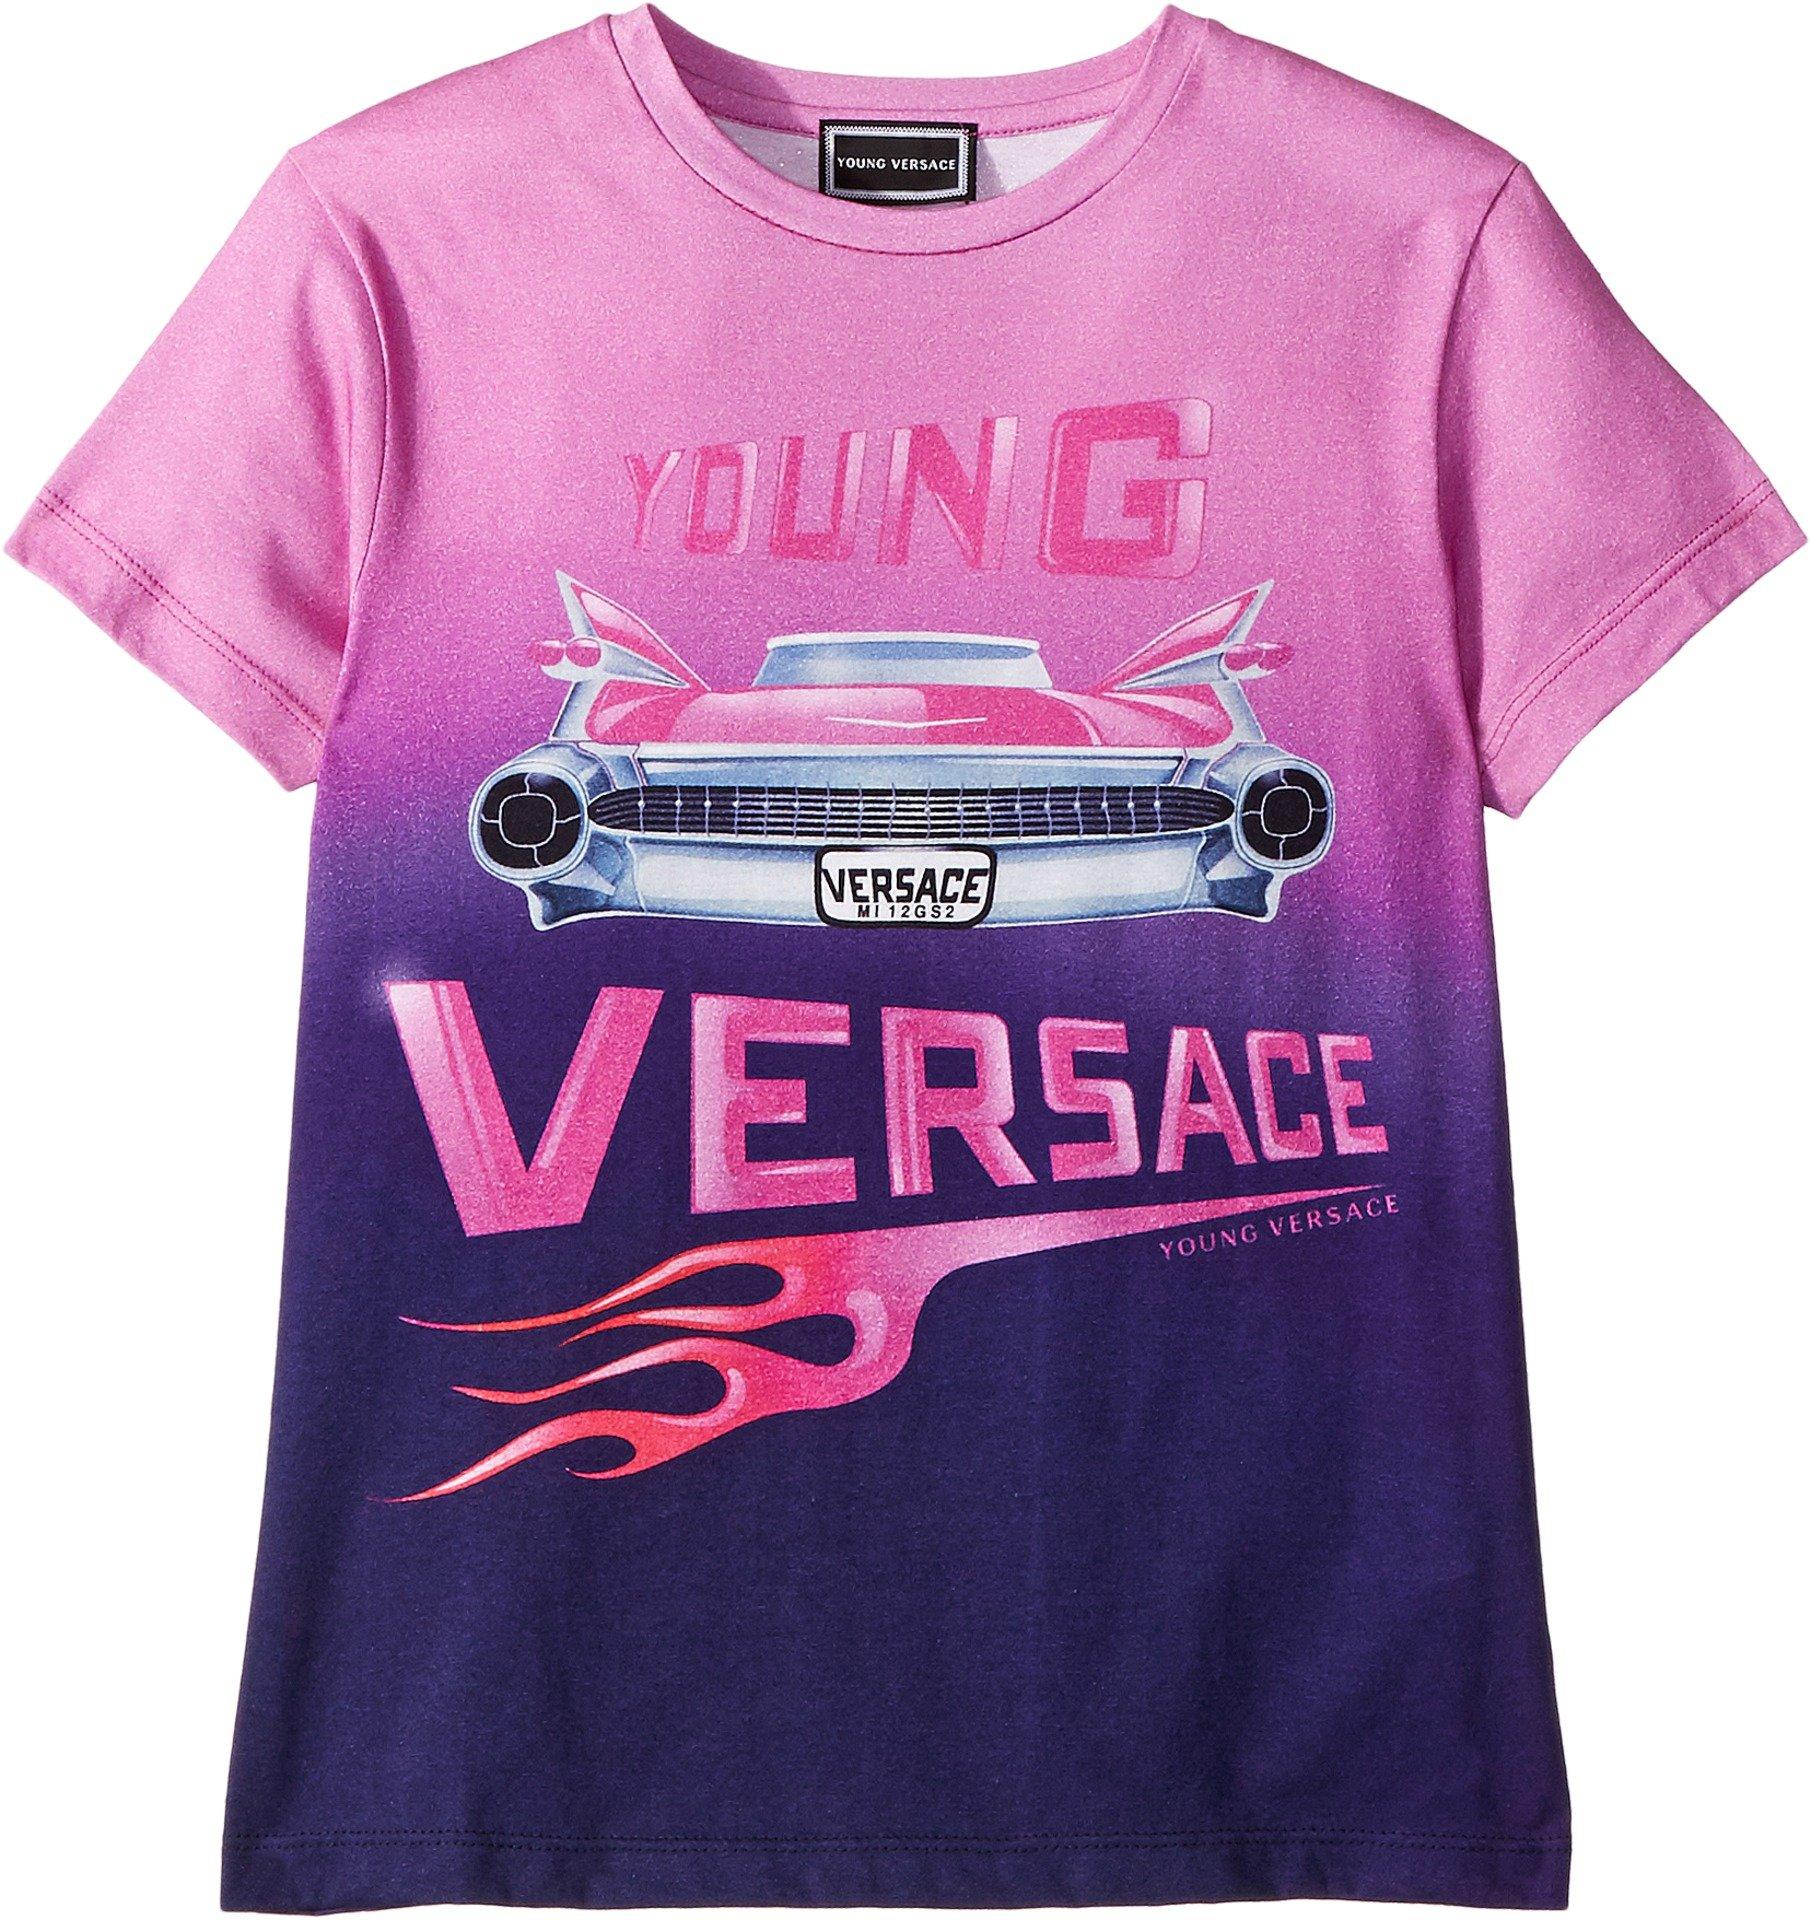 Versace Kids Girl's Short Sleeve Logo Car Graphic T-Shirt (Big Kids) Pink/Multi 9-10